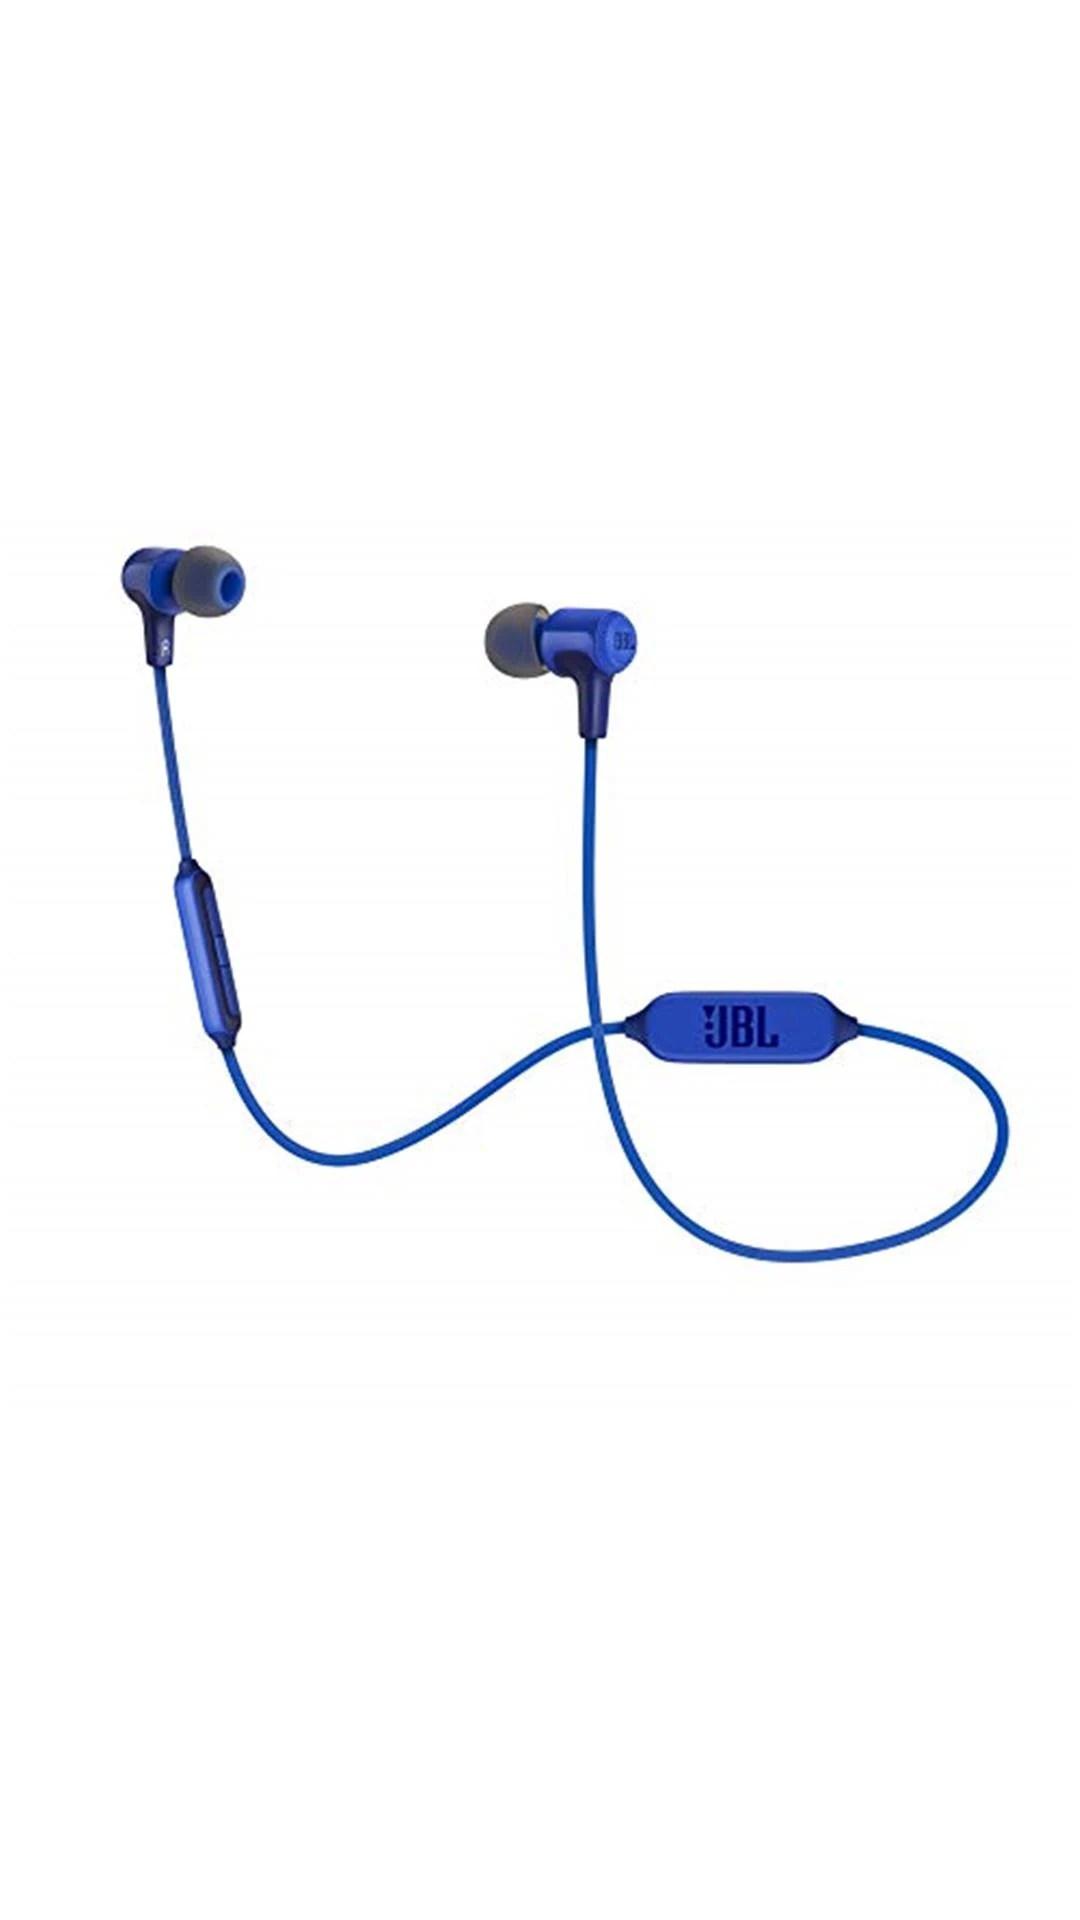 medium resolution of  headphone jack sizes chart jbl headset mic wiring diagram wiring diagram priv on apple headphone wiring diagram